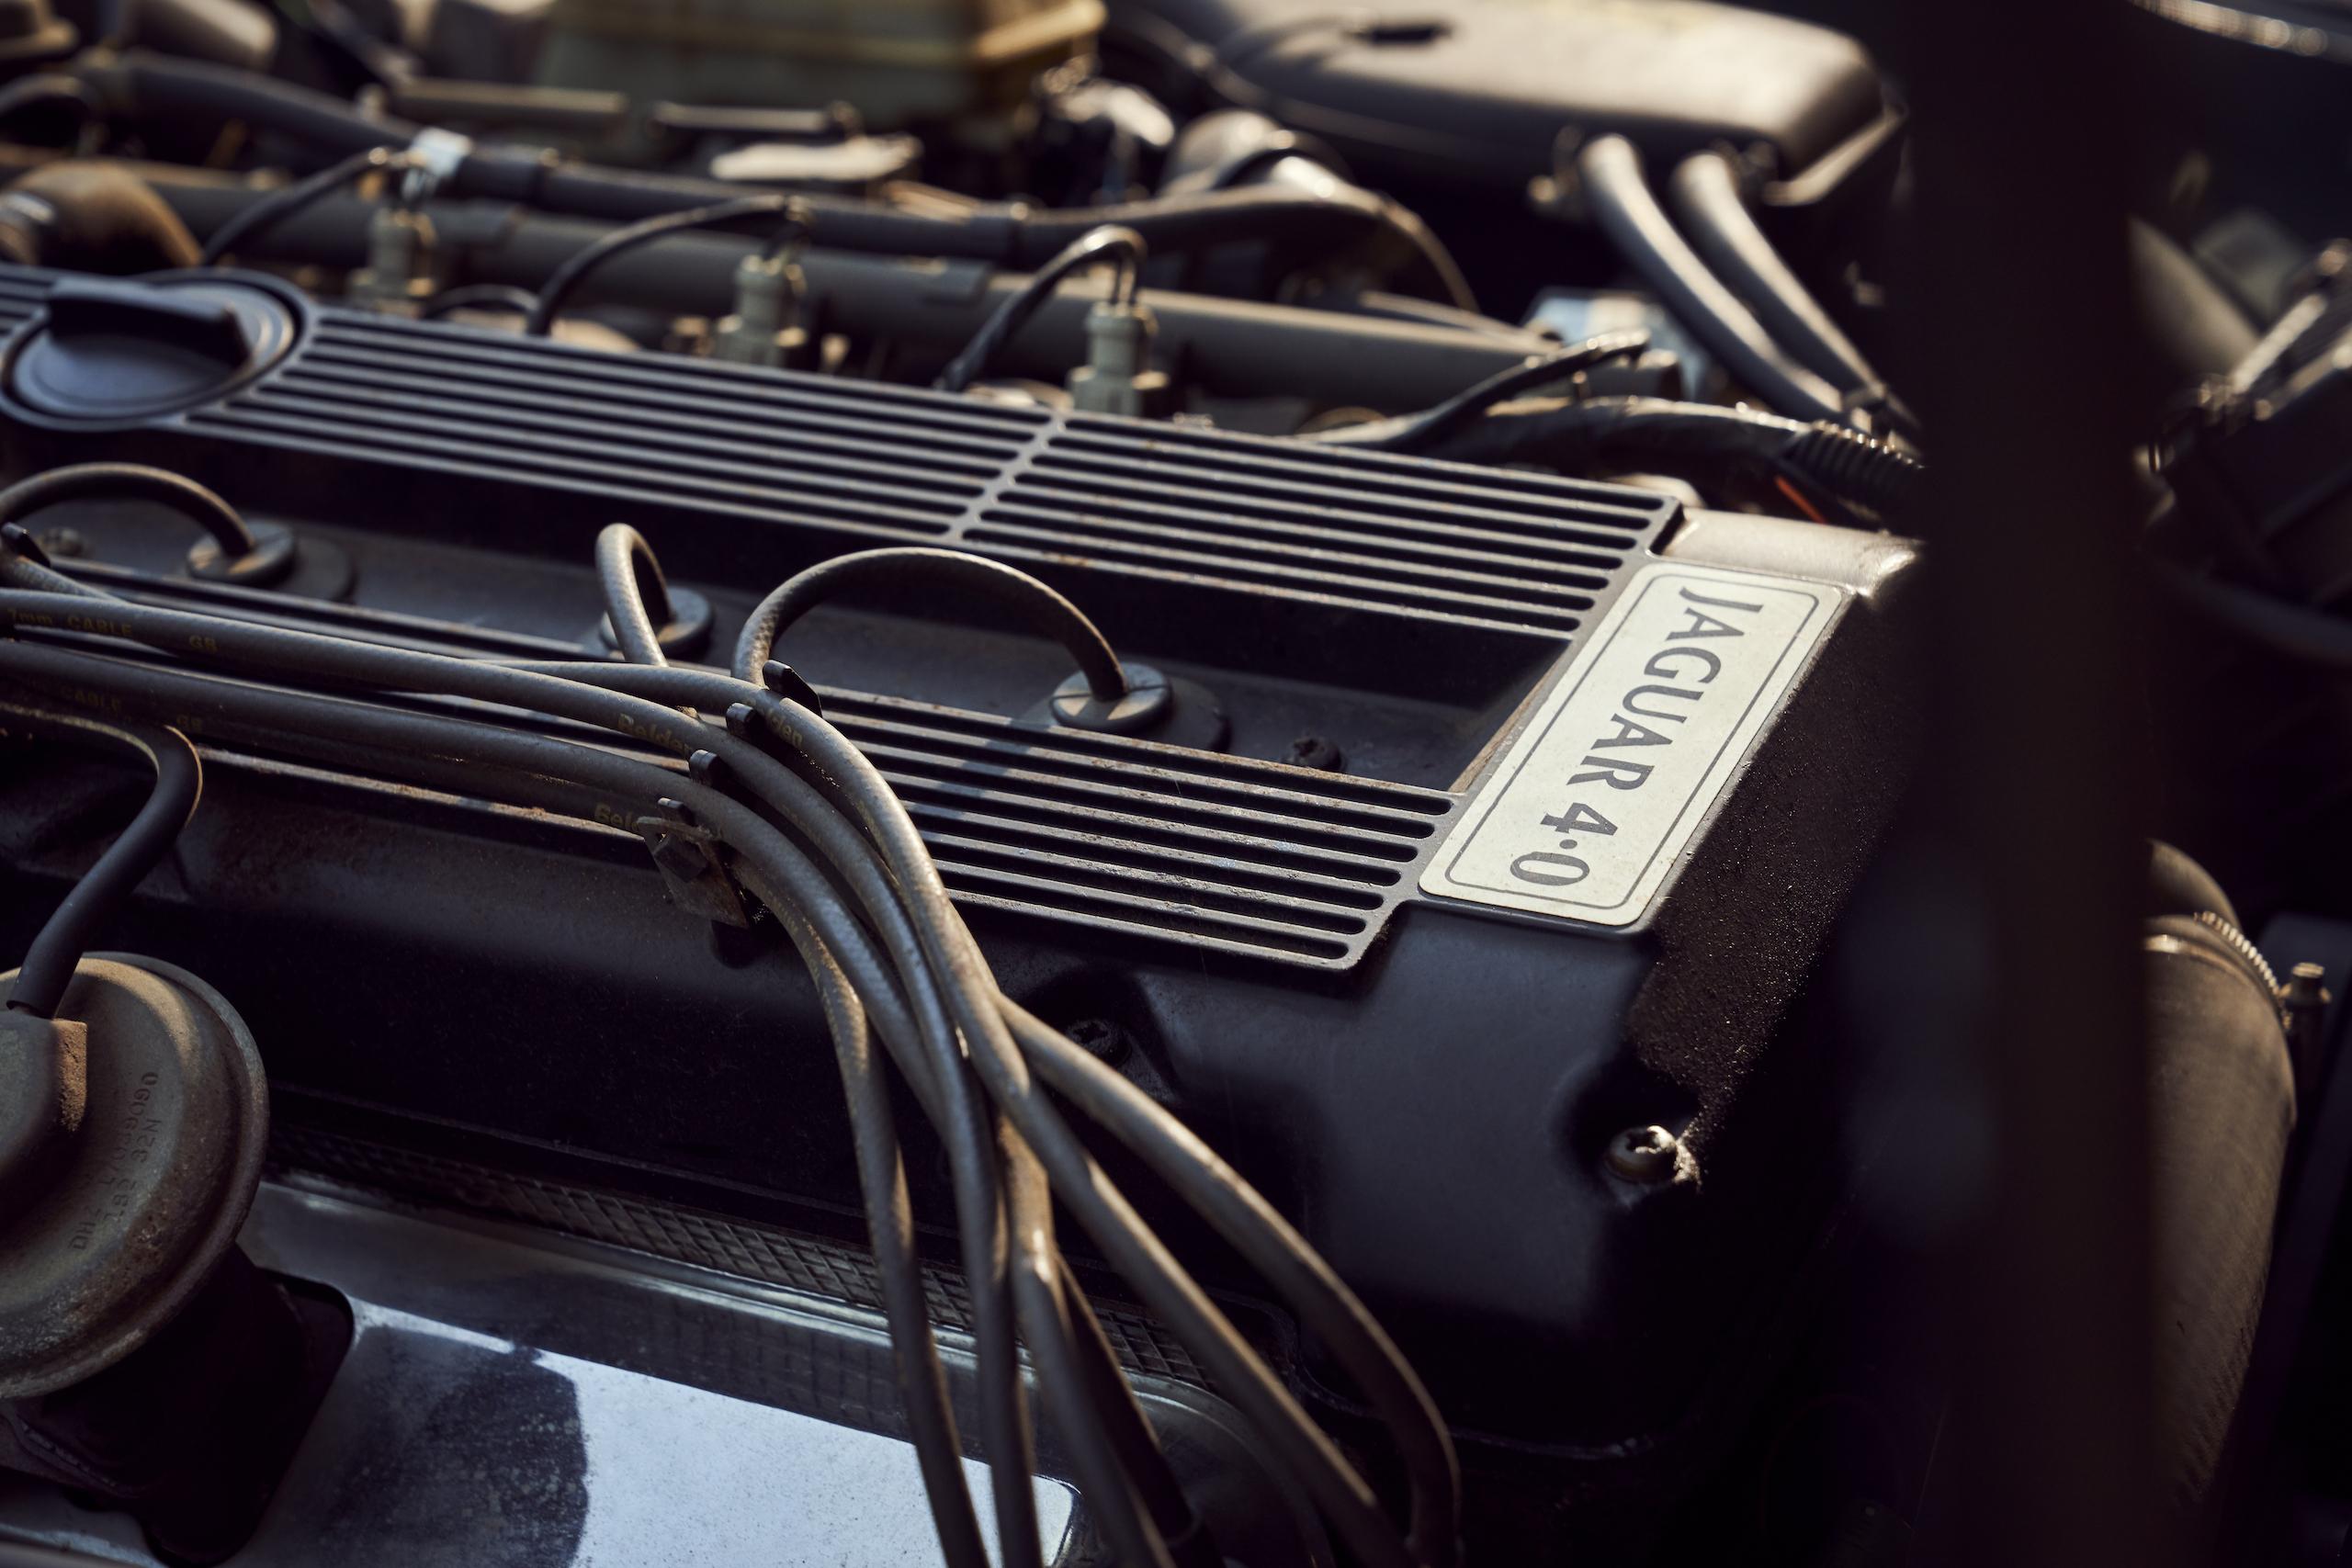 Jaguar XJ6 engine top